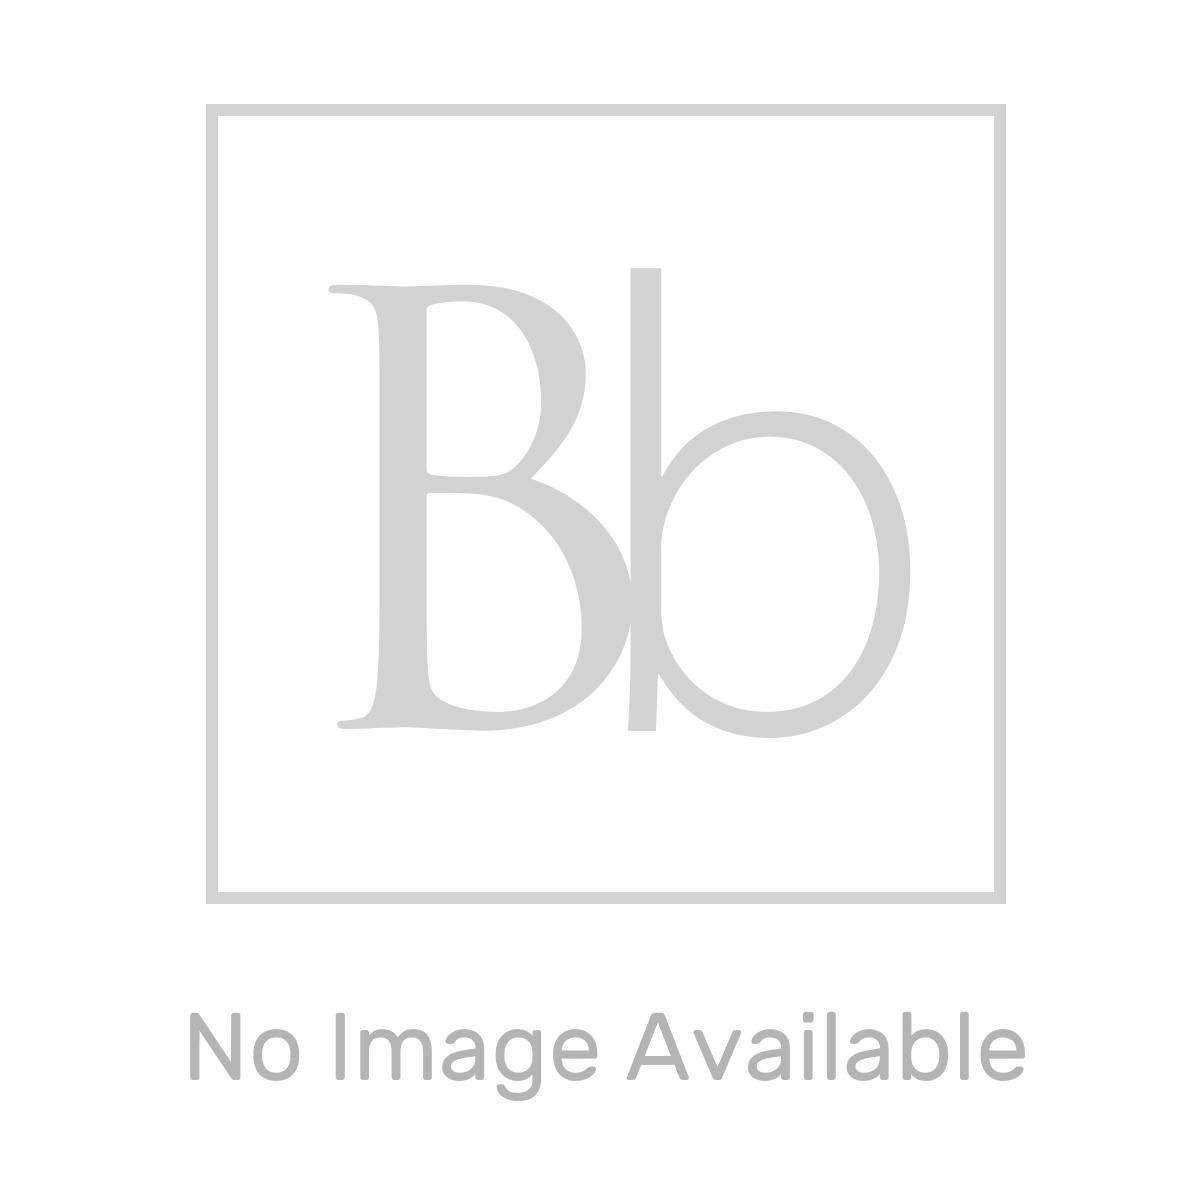 Mito Floor Standing Vanity Unit 500mm Line Drawing 2